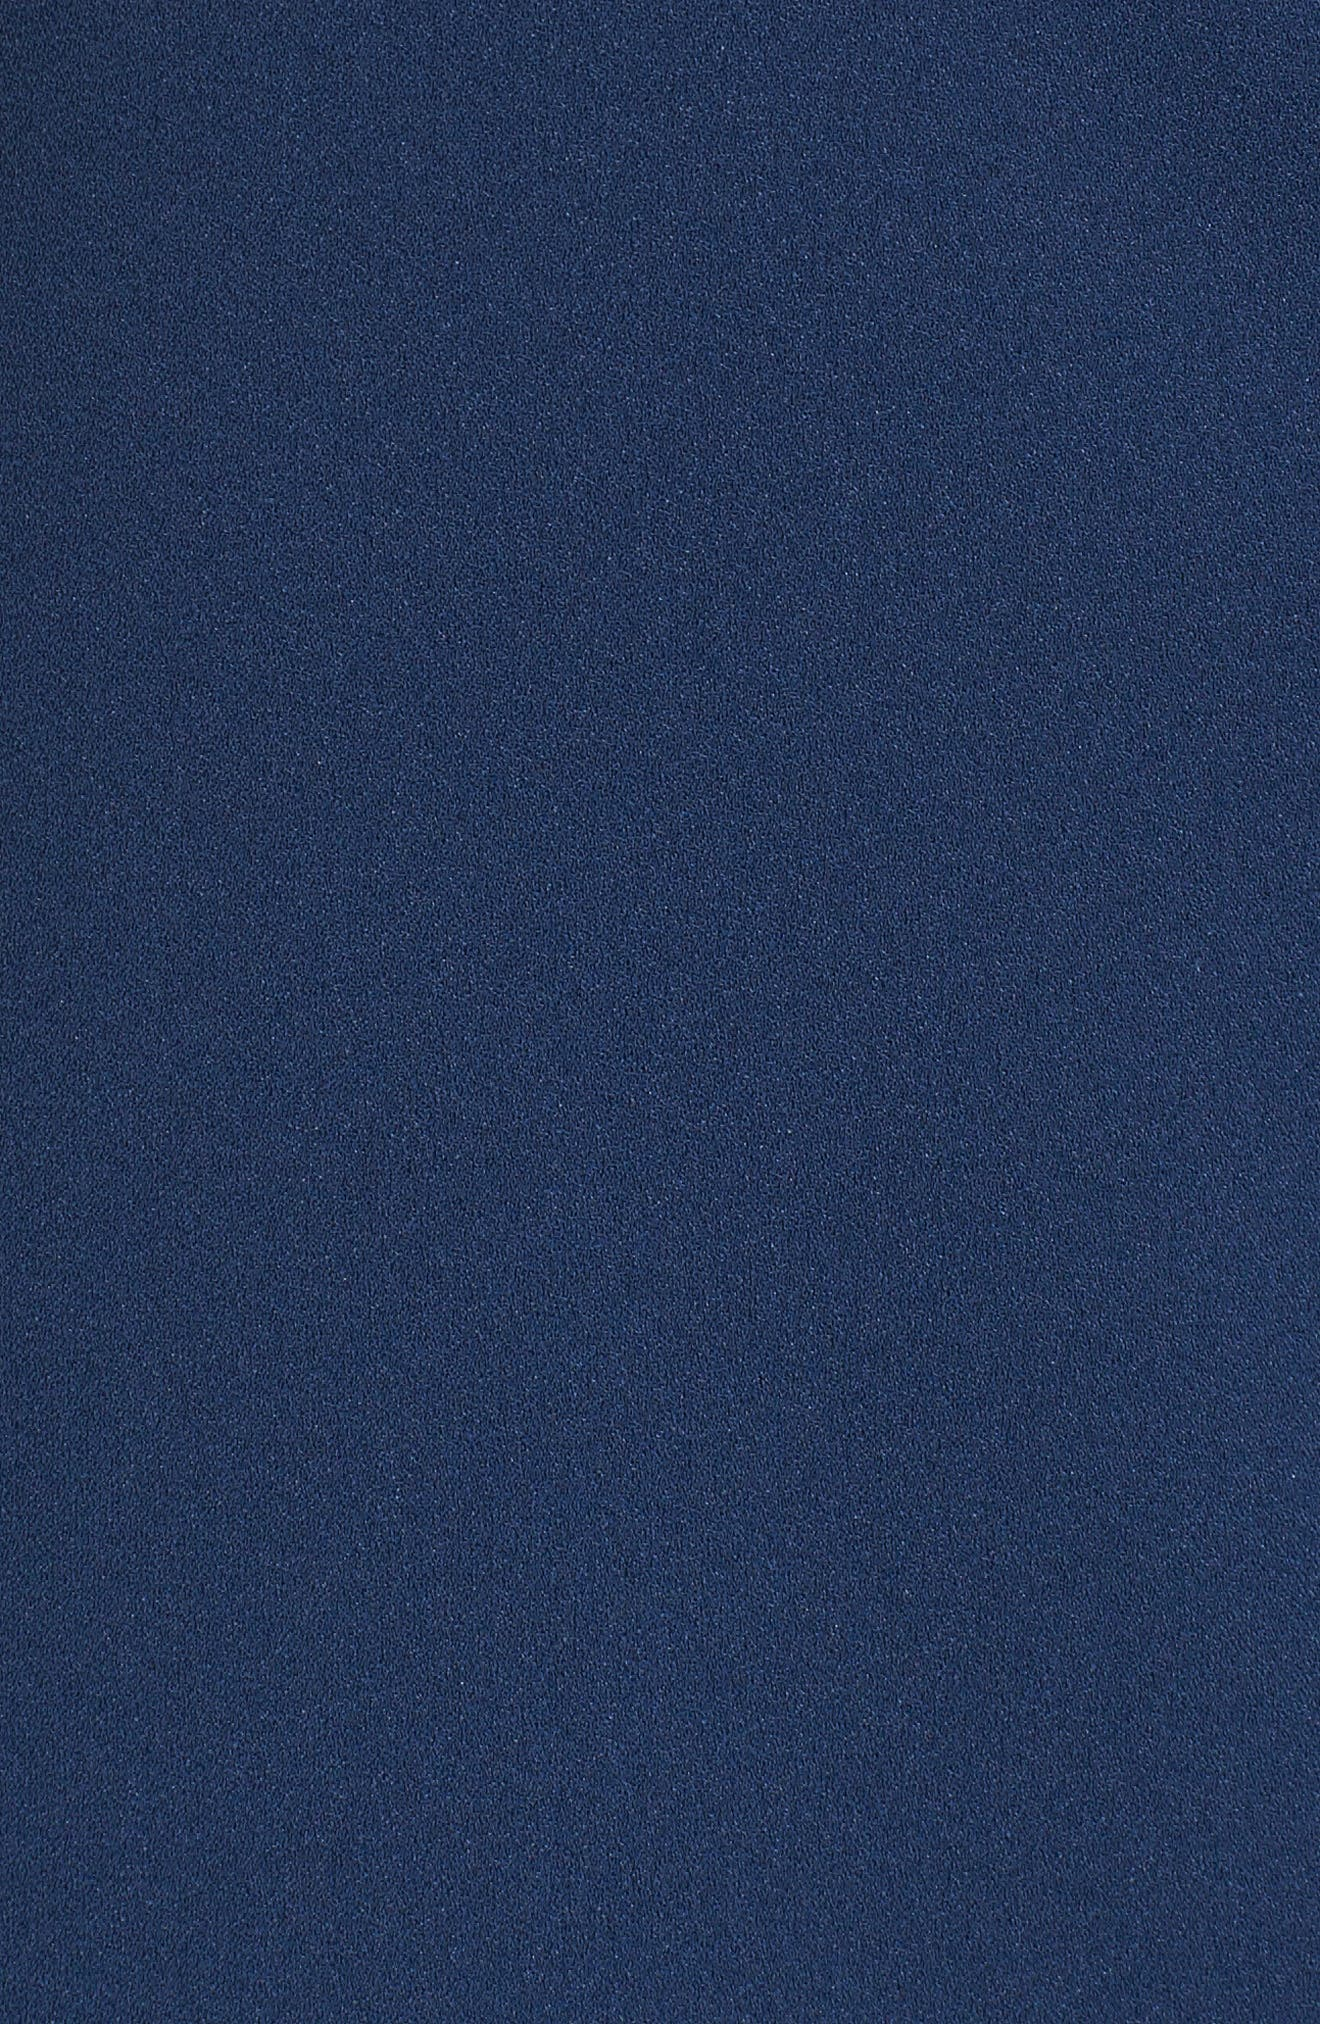 Vera Lace Sleeveless Blouse,                             Alternate thumbnail 5, color,                             Navy